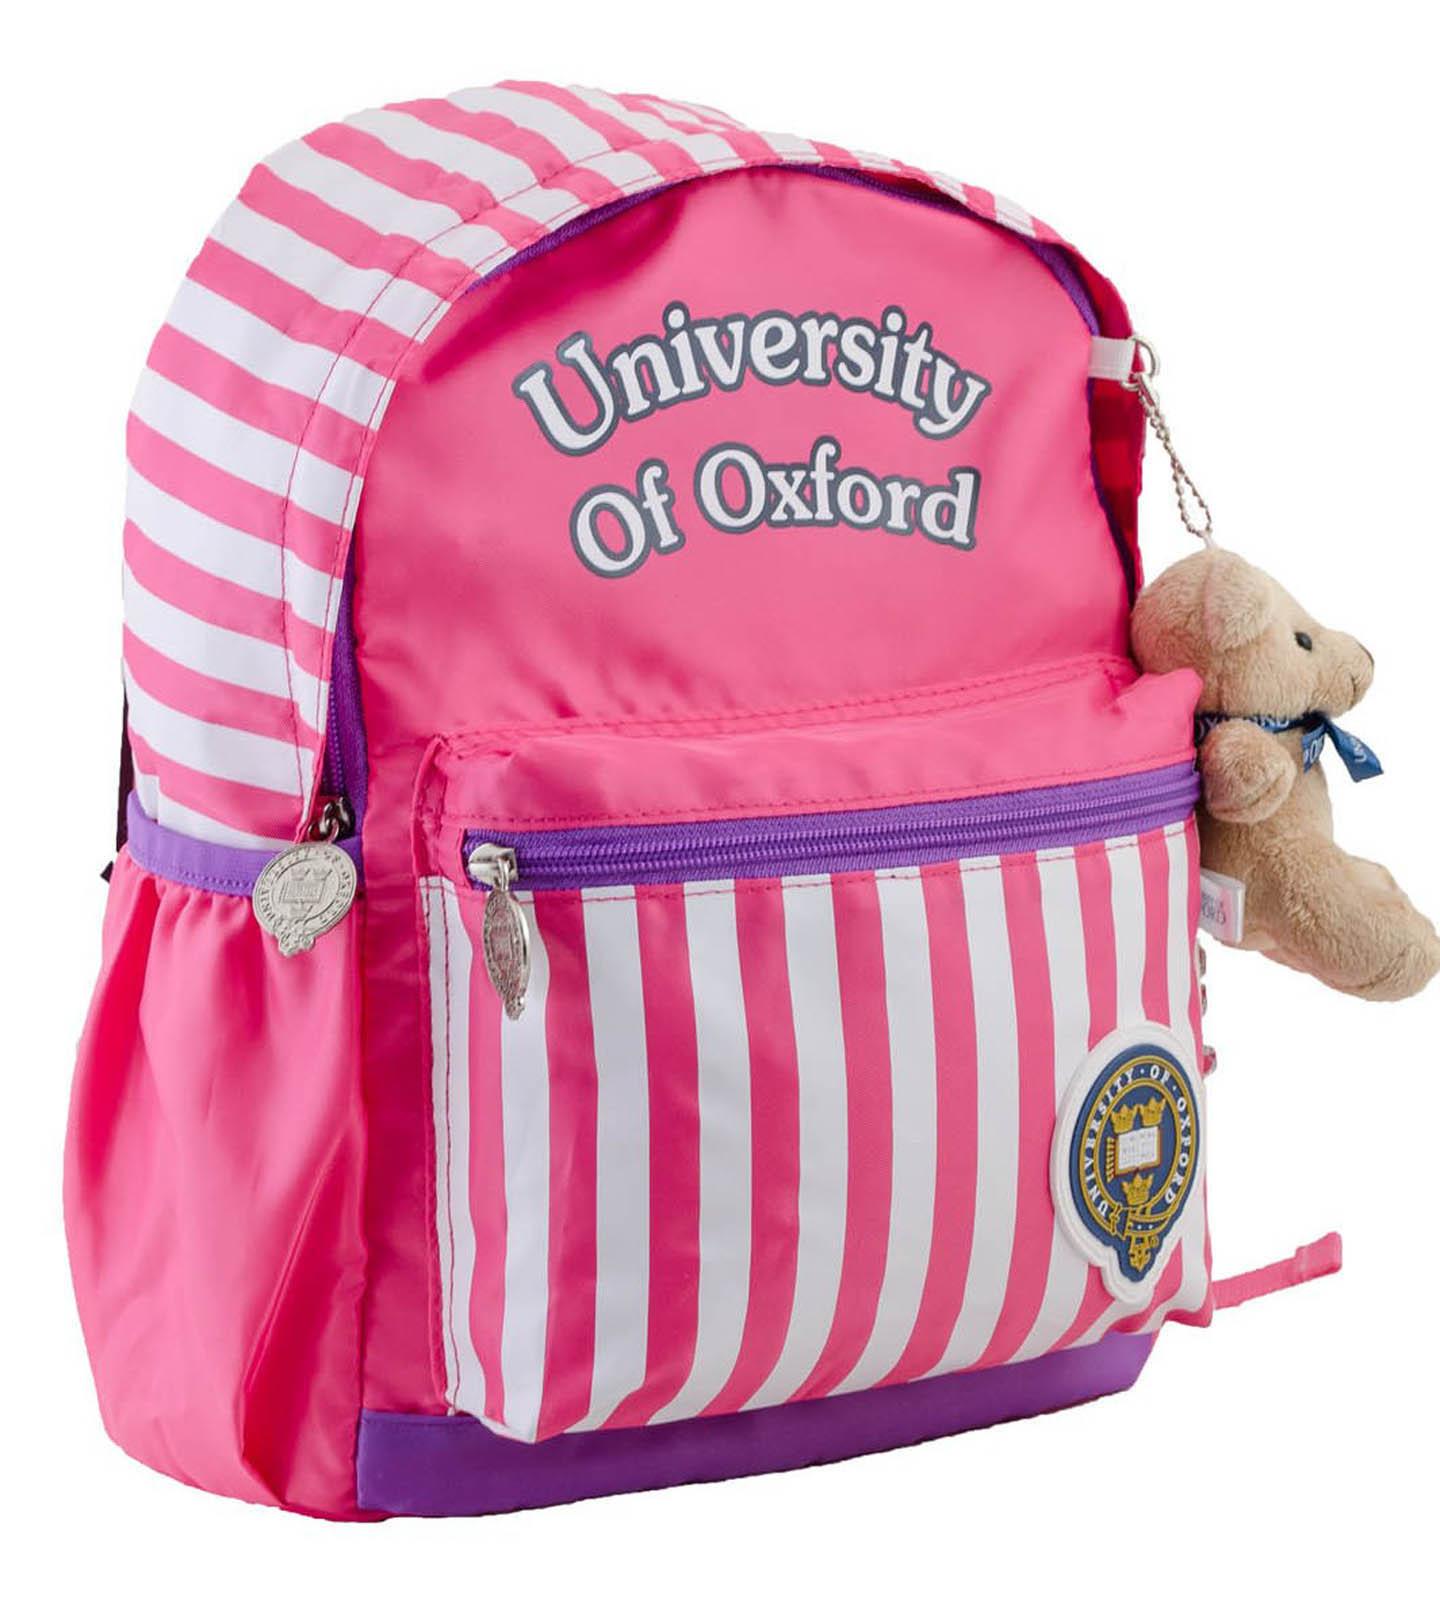 Рюкзак детский  YES  OX-17, розовый, 24.5*32*14